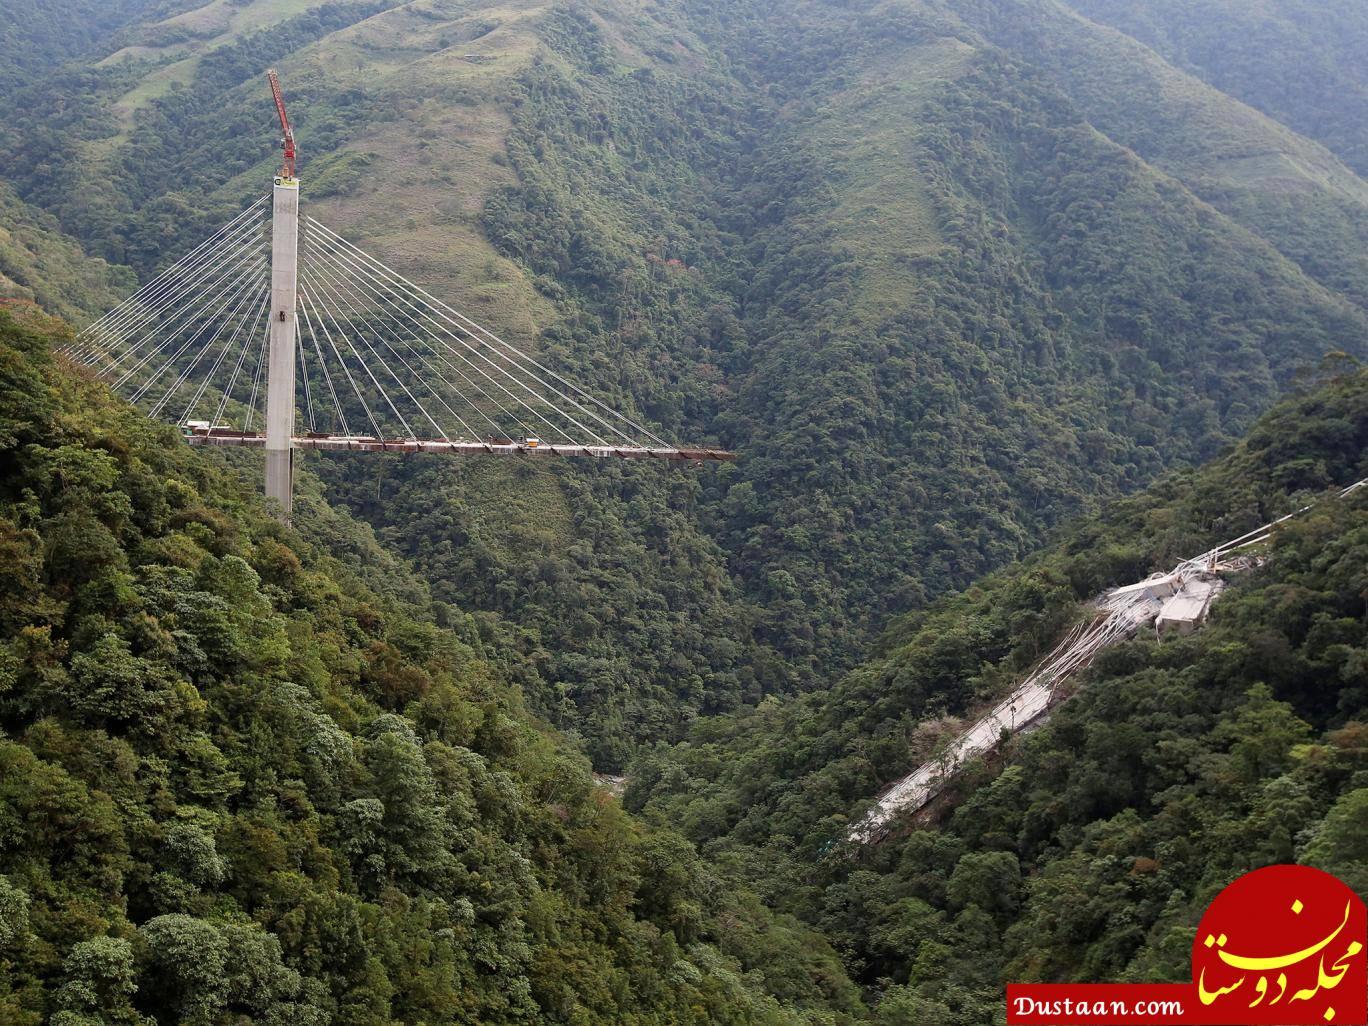 www.dustaan.com فرو ریختن پل نیمه کاره در کلمبیا جان 9 تن را گرفت +تصاویر